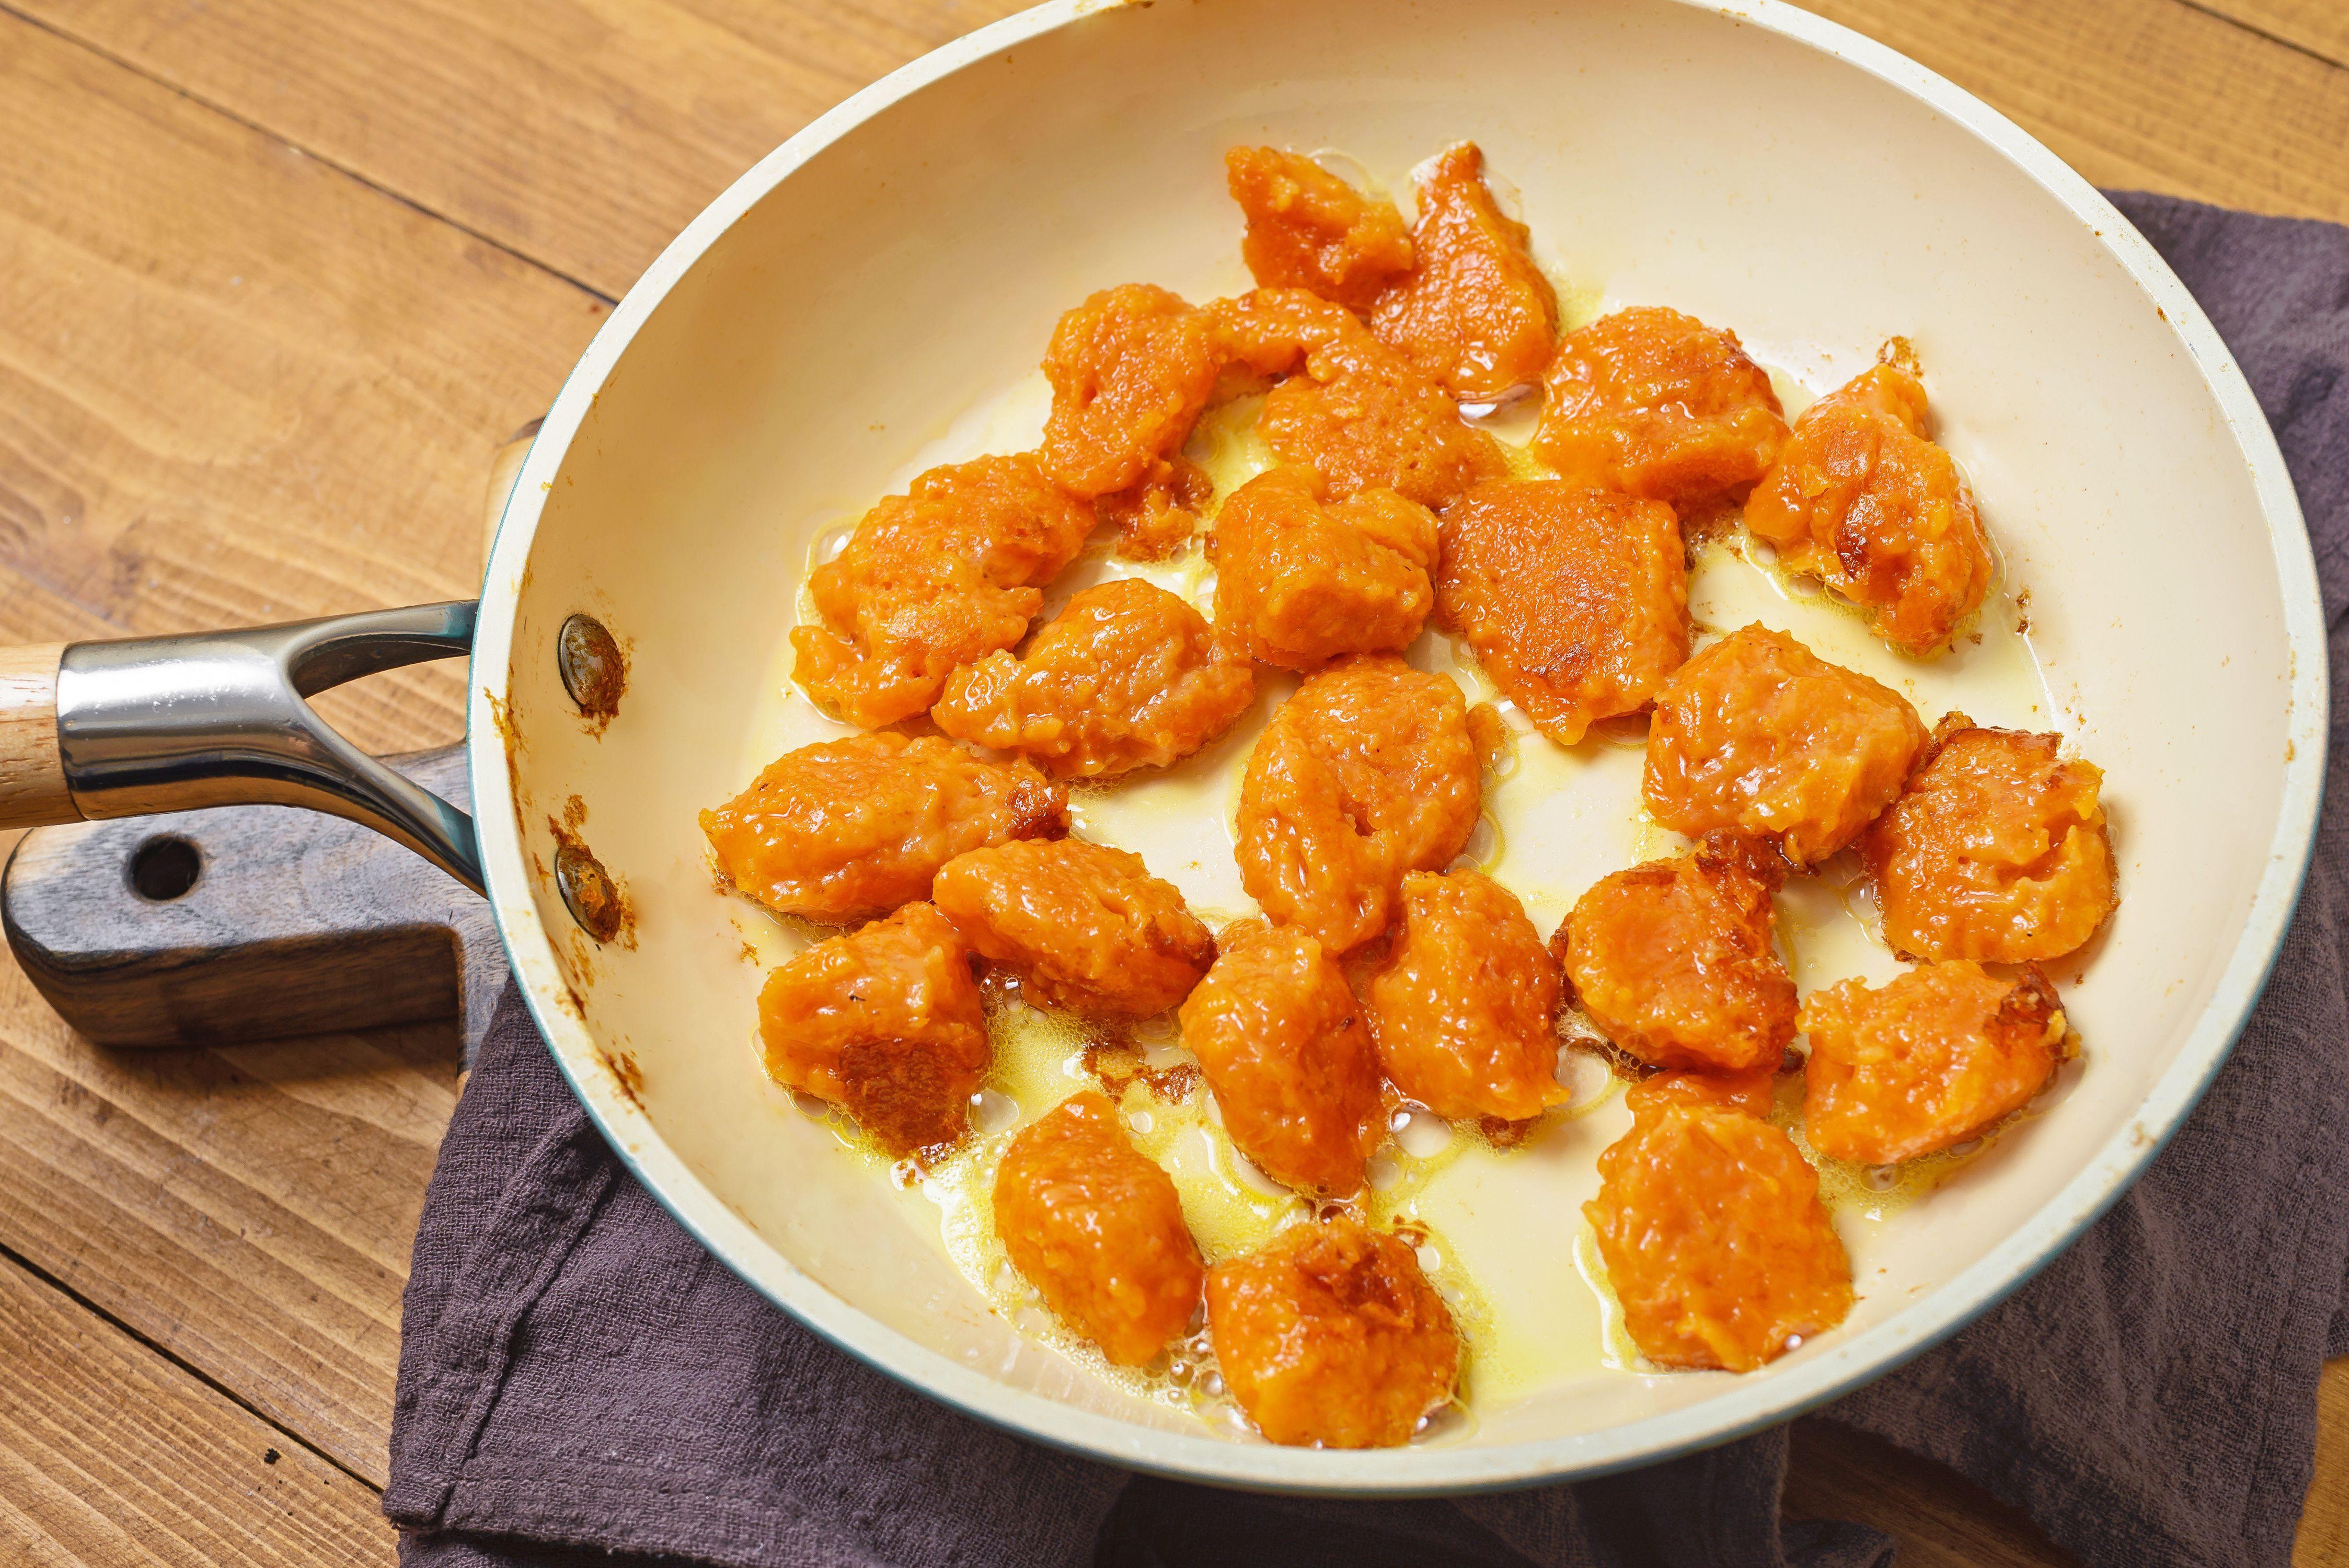 Saute dumplings